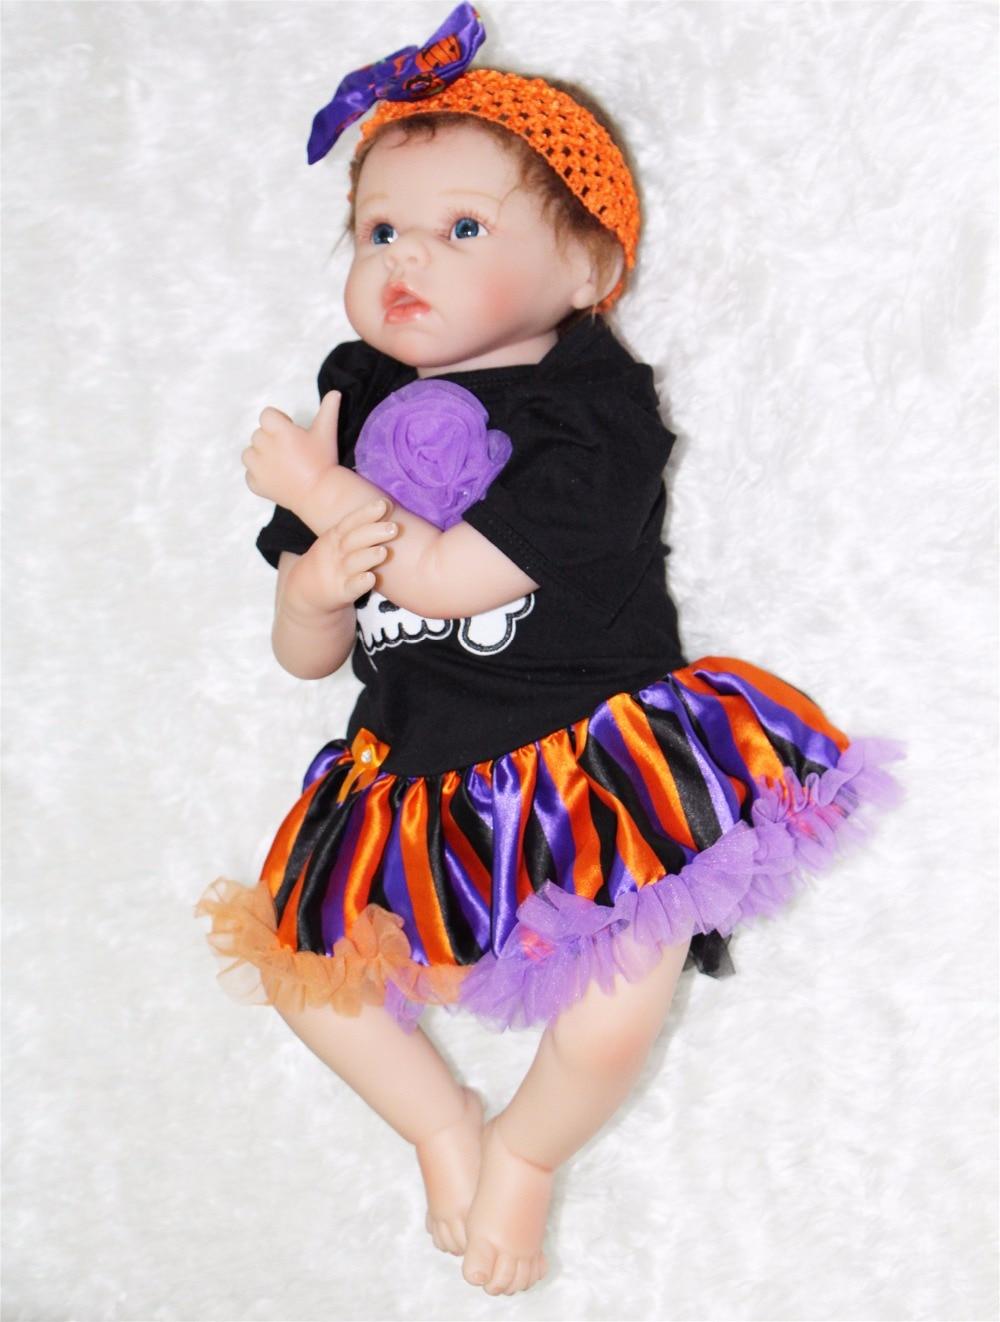 55cm bebe doll reborn Silicone Reborn babies soft cotton body Handmade Realistic Baby Dolls girls xmas gift bonecas